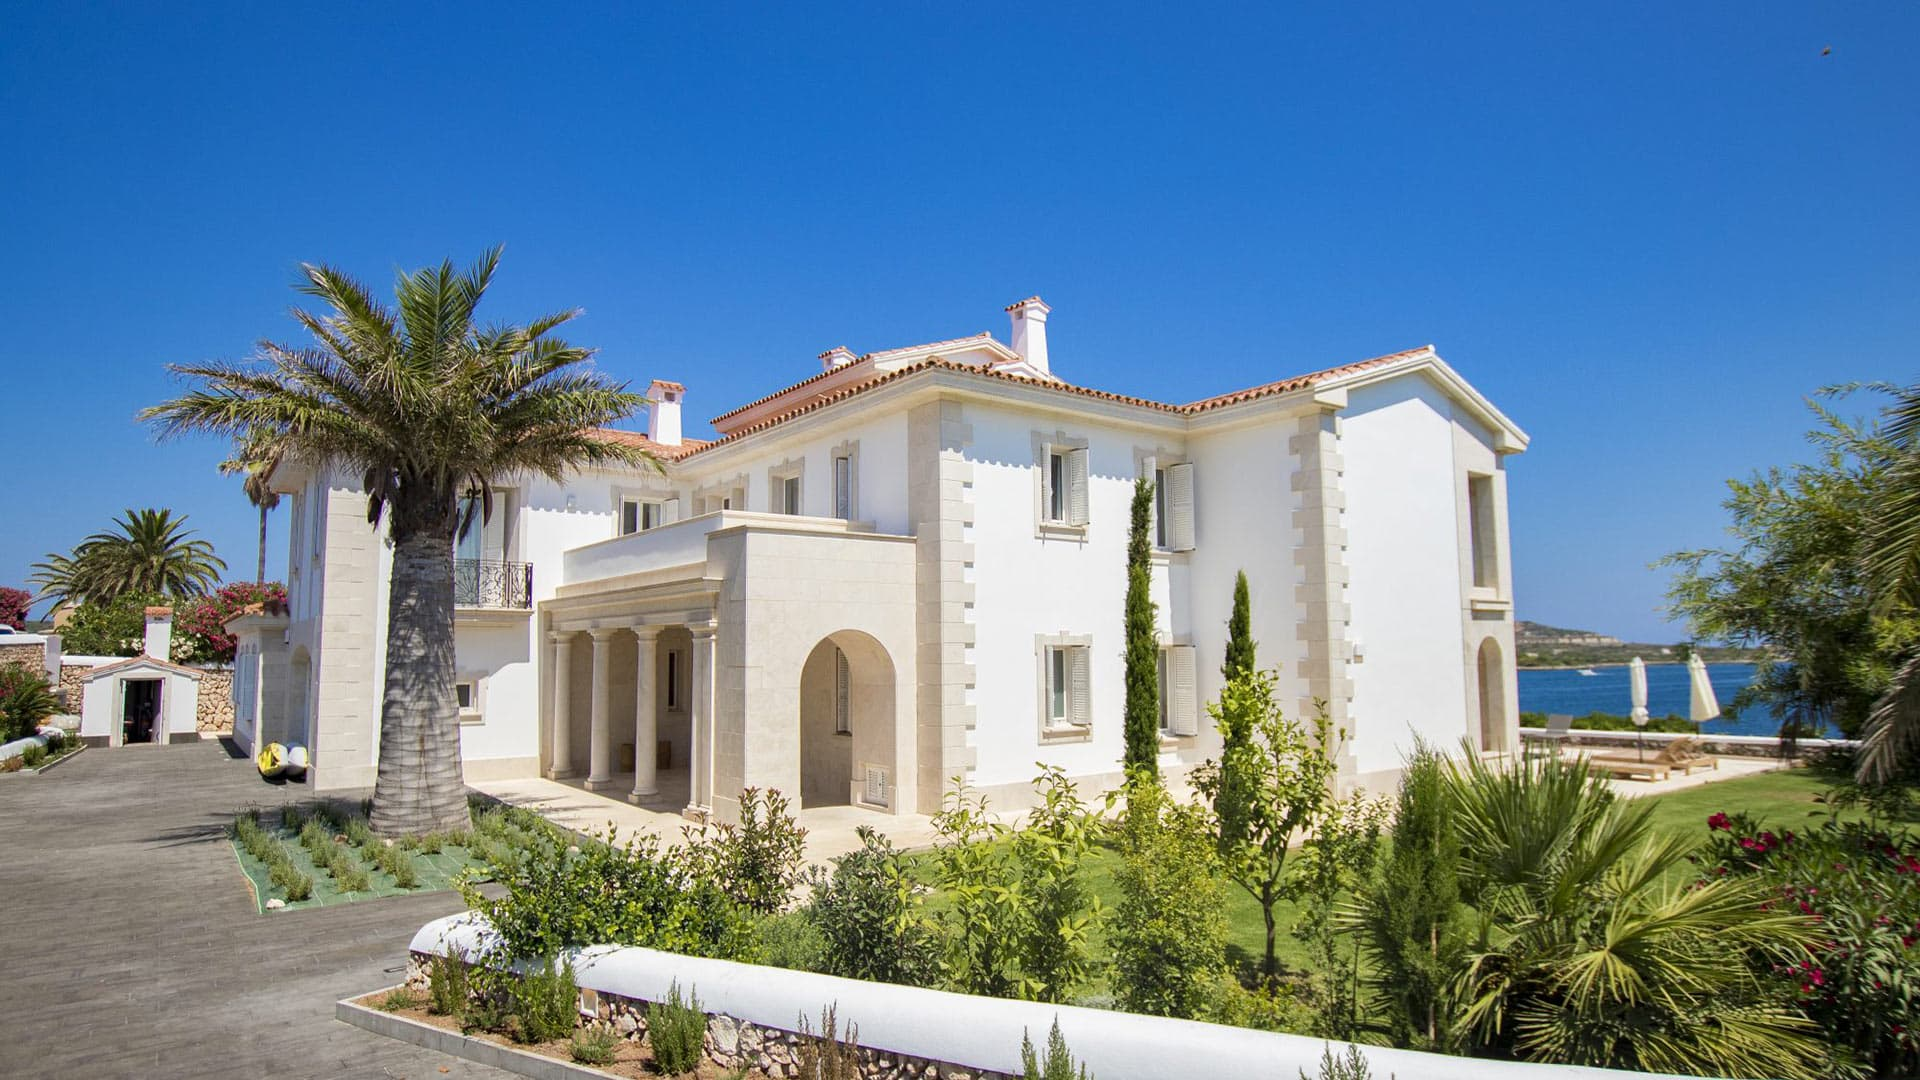 Villa Villa Manicienta, Rental in Menorca